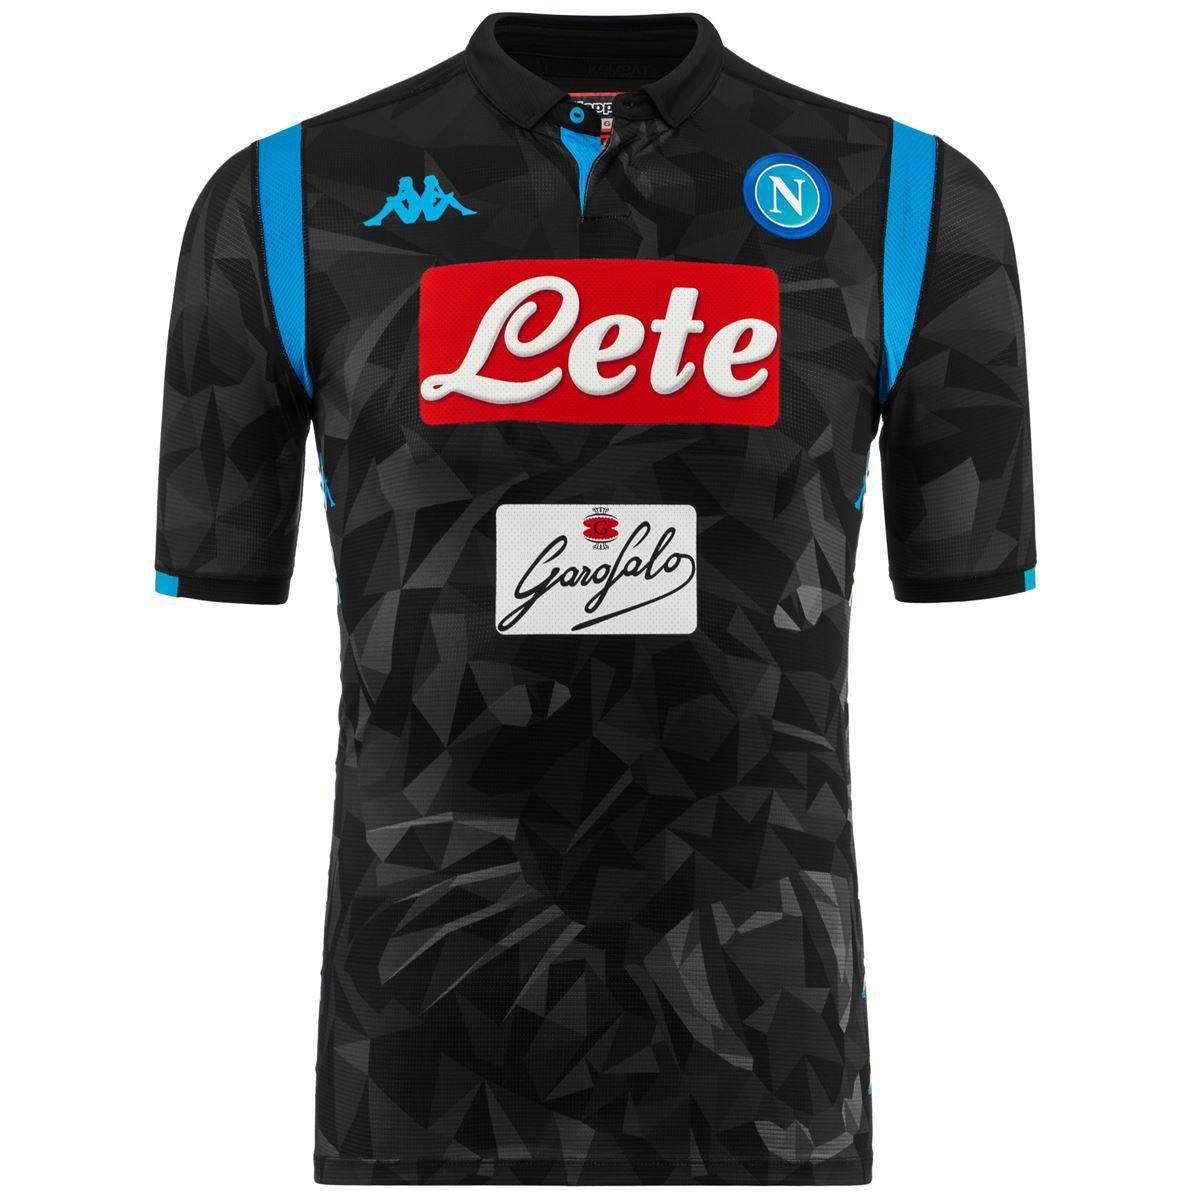 Napoli home jersey